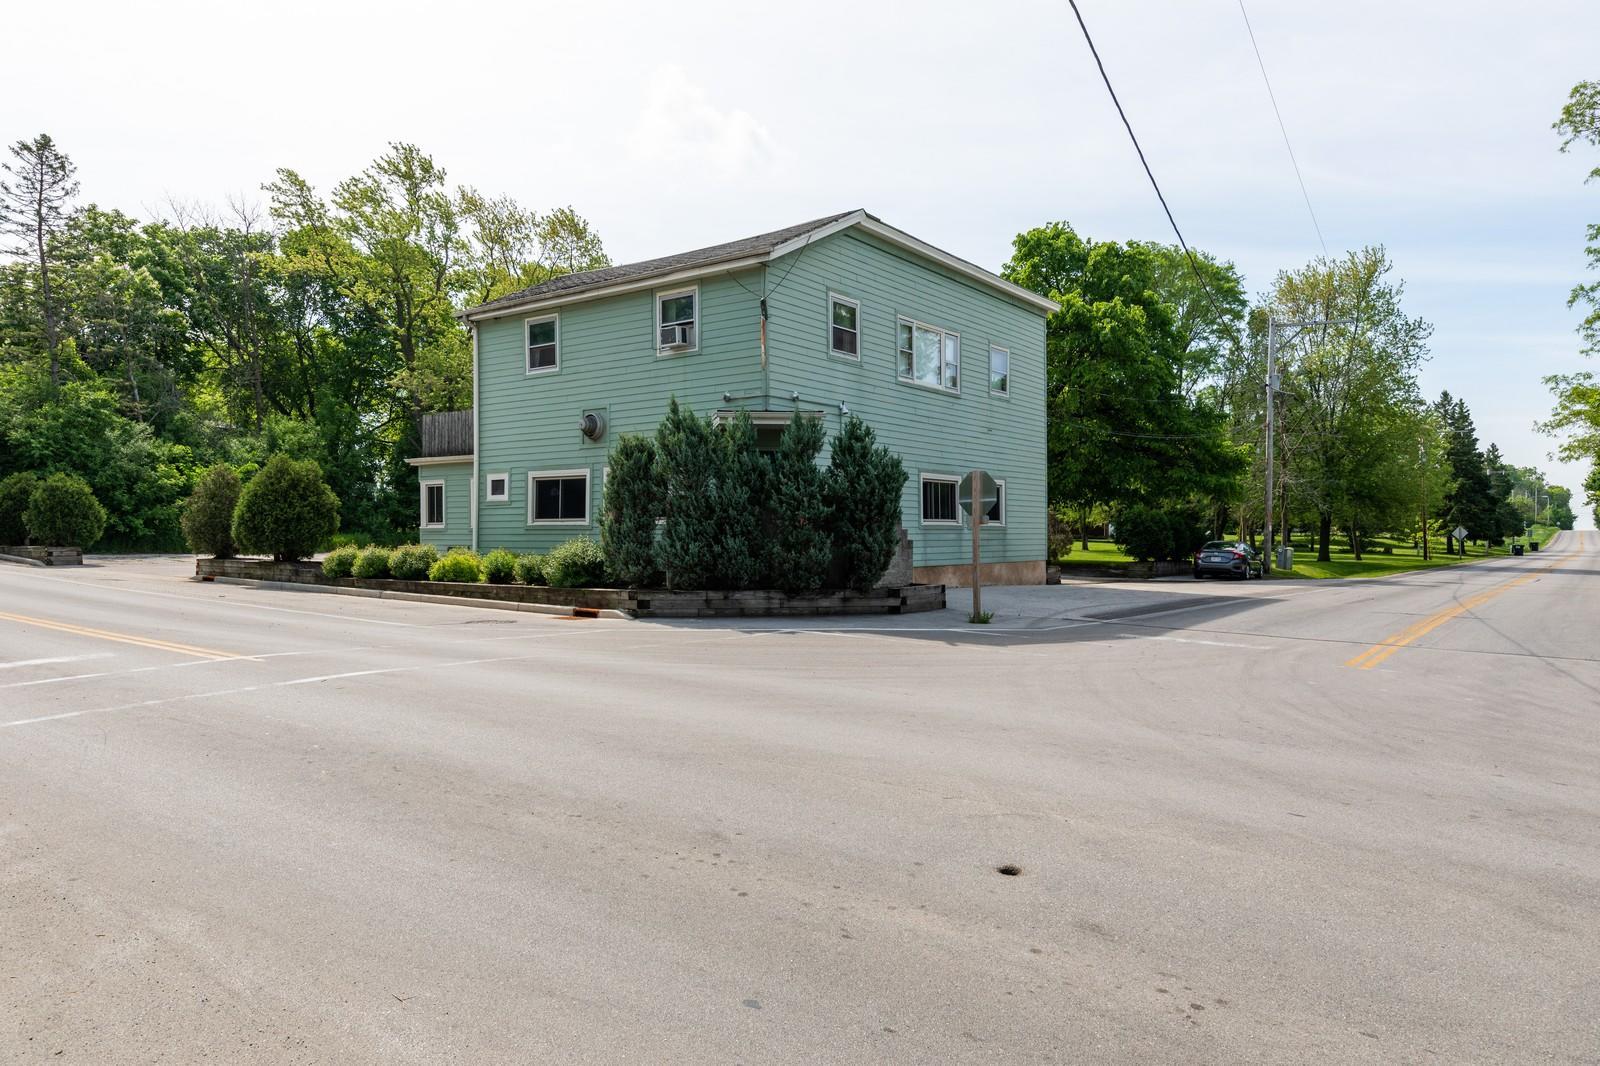 Photo of 10631 W Freistadt Rd, Mequon, WI 53097